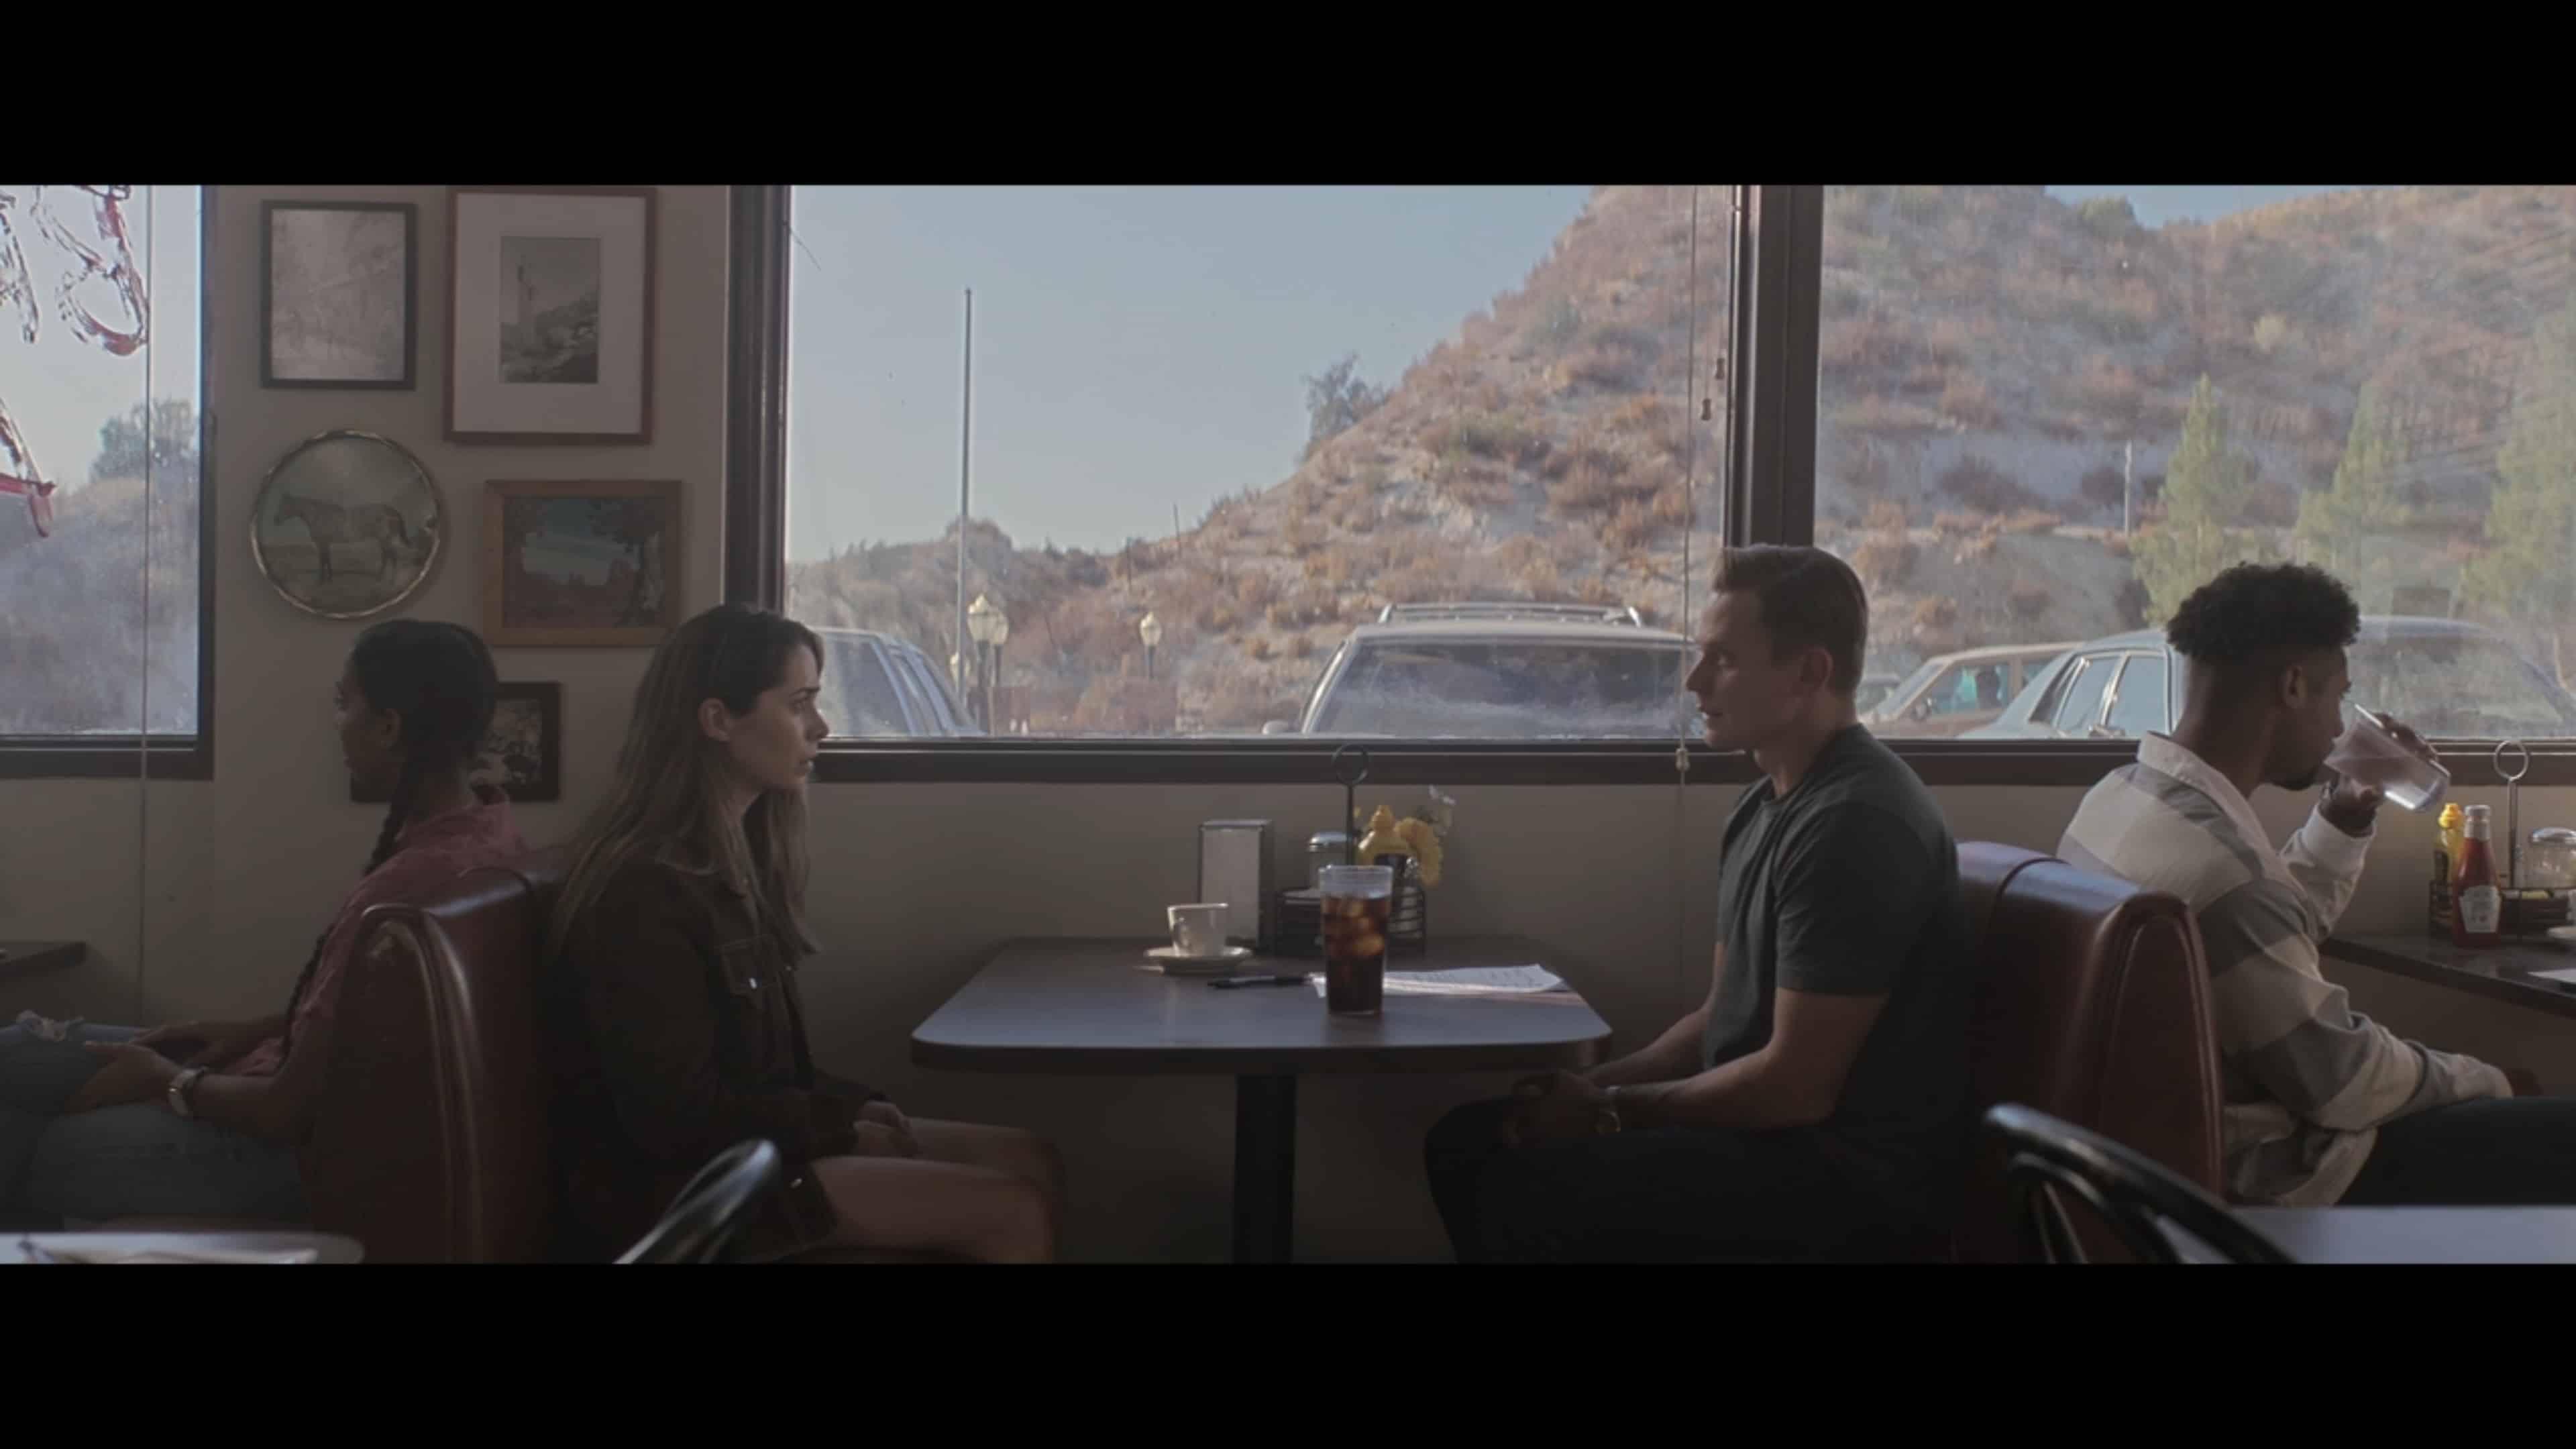 Hazel and Byron sitting at a diner together